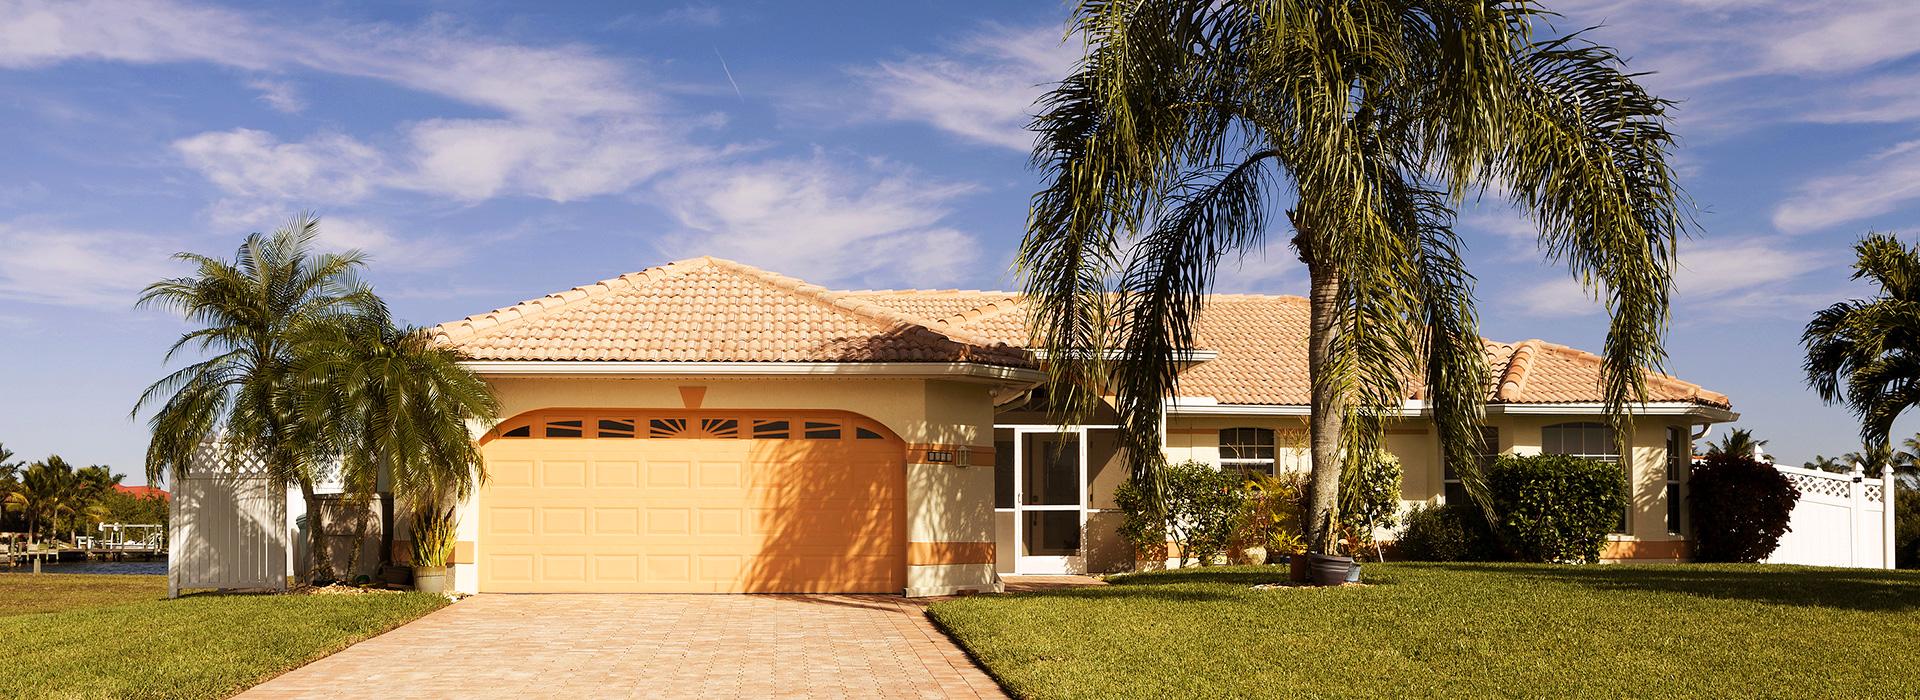 John Galt Homeowners Insurance